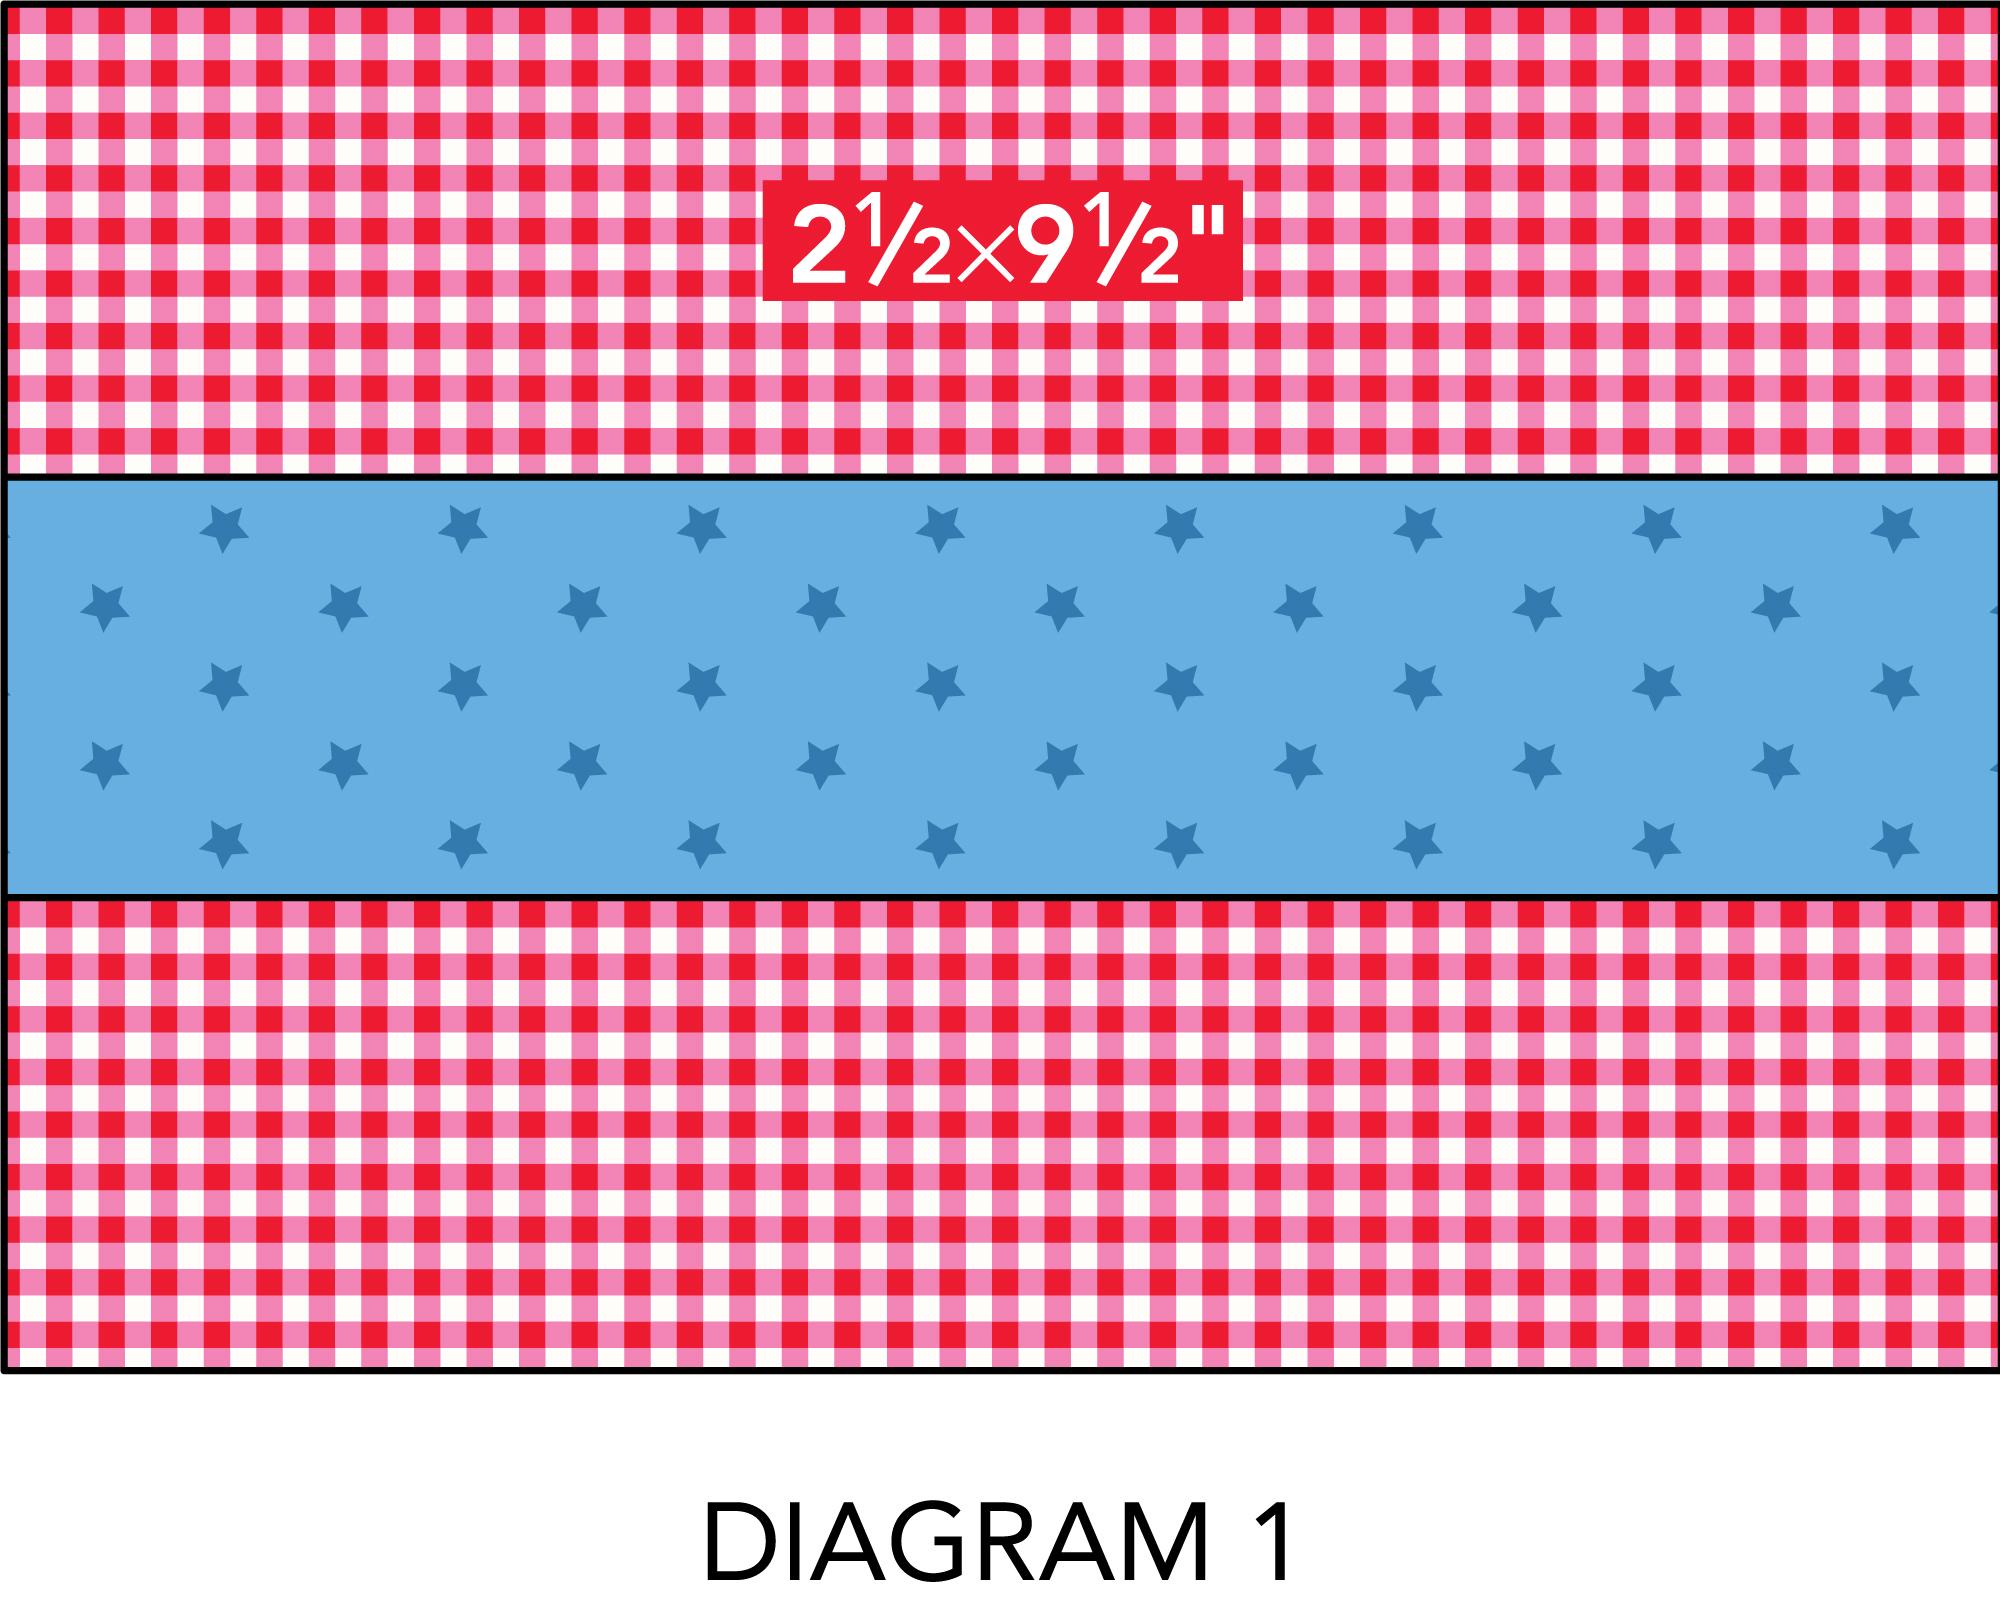 Easy as 1-2-3 diagram 1